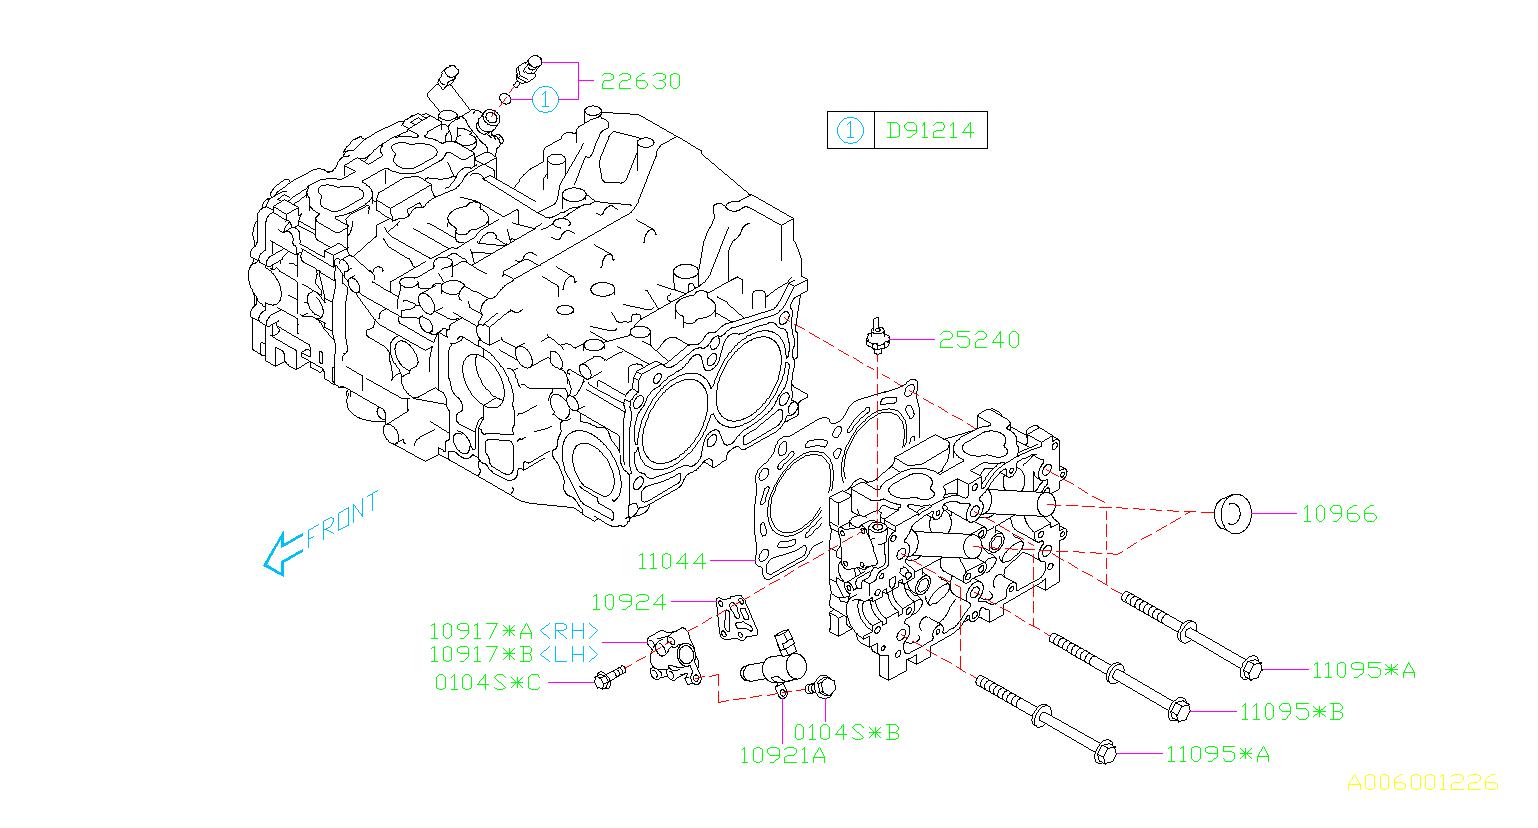 Subaru Forester Engine Variable Valve Timing (VVT